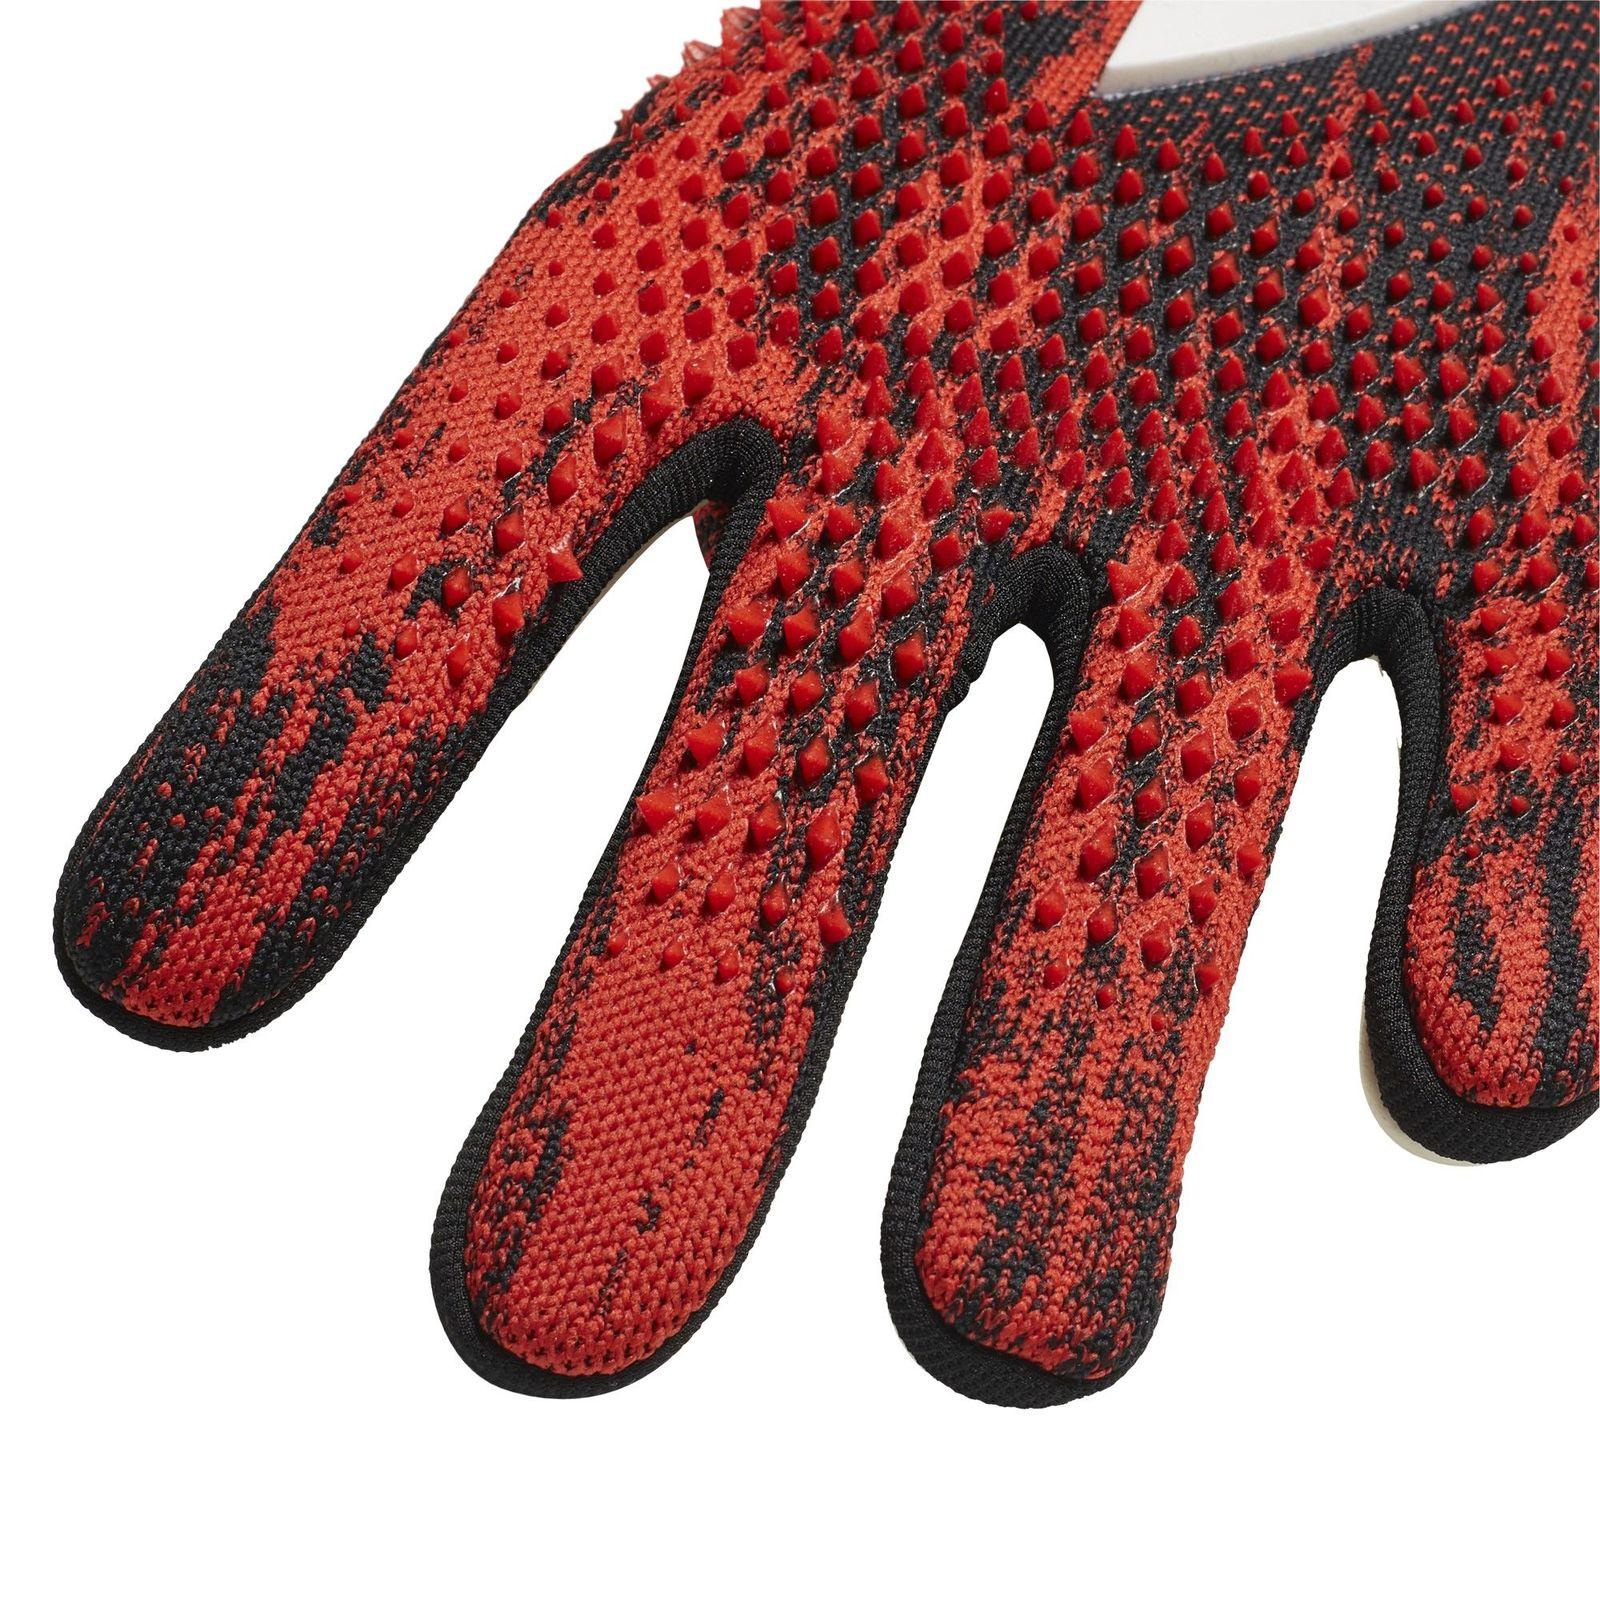 Adidas: Predator 20 Pro Gloves - (Size 11) image